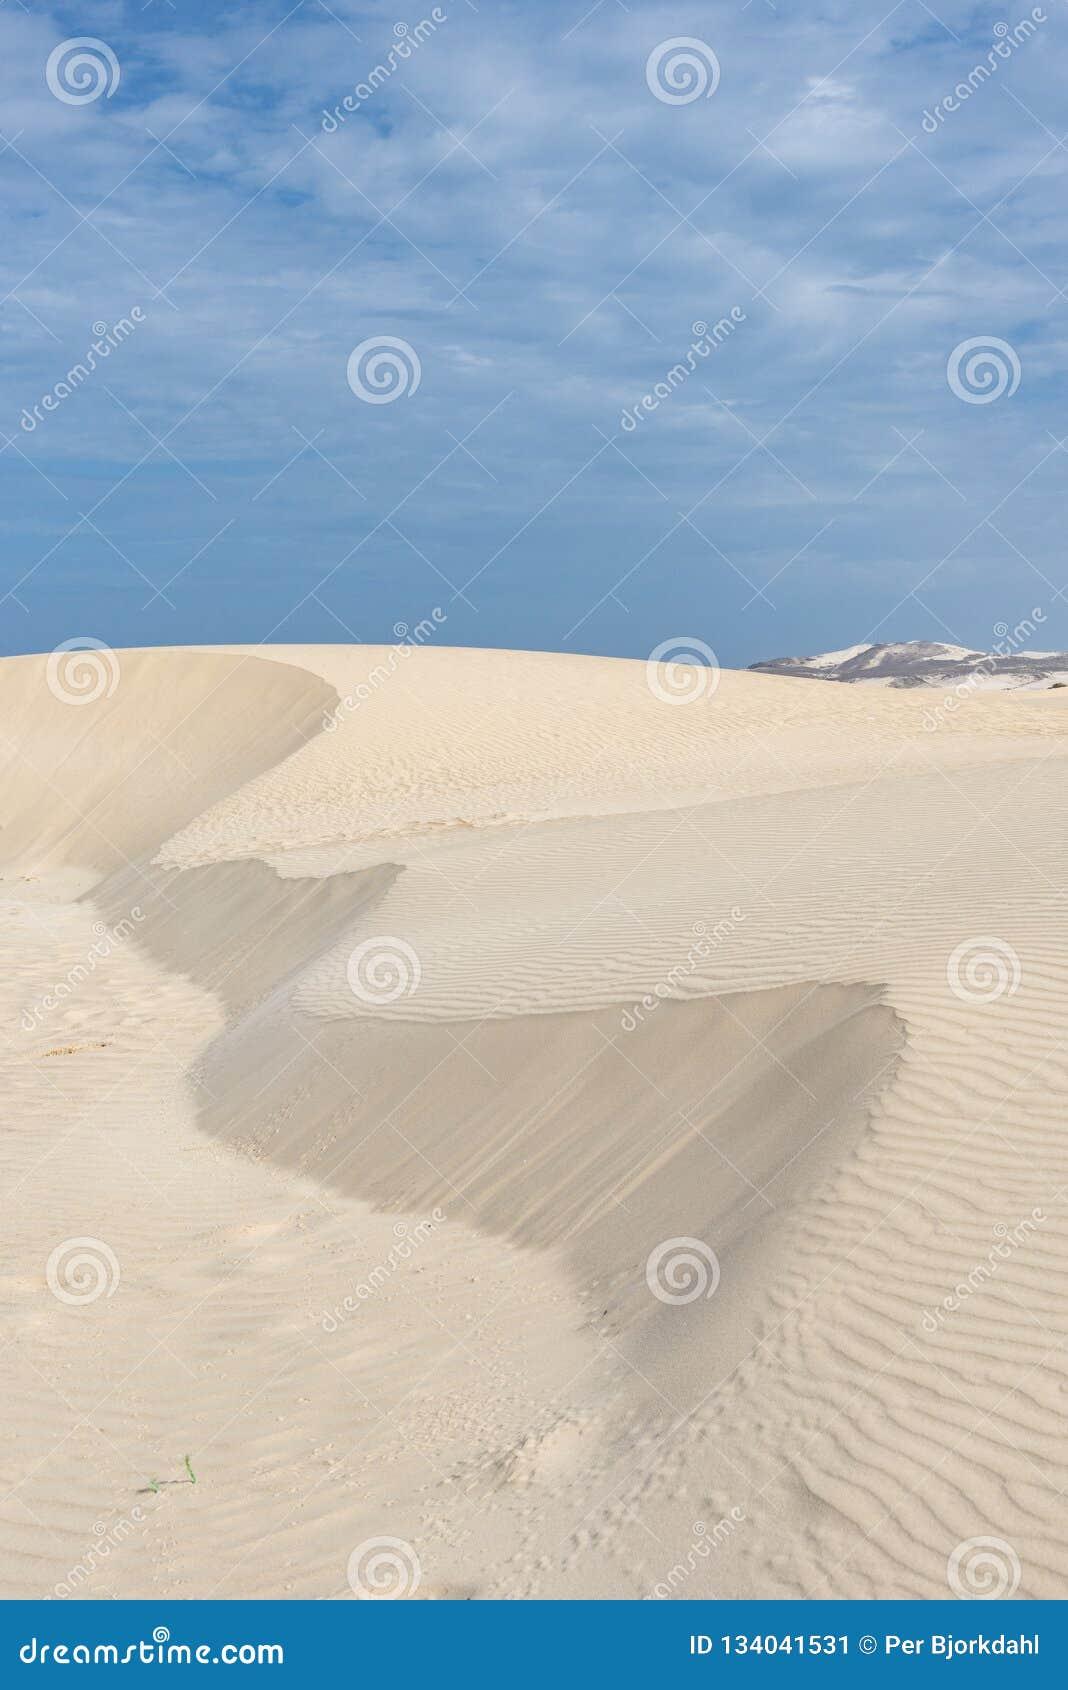 Sand Dune Santa Monica Beach Boa Vista Stock Image Image Of Nature Protected 134041531